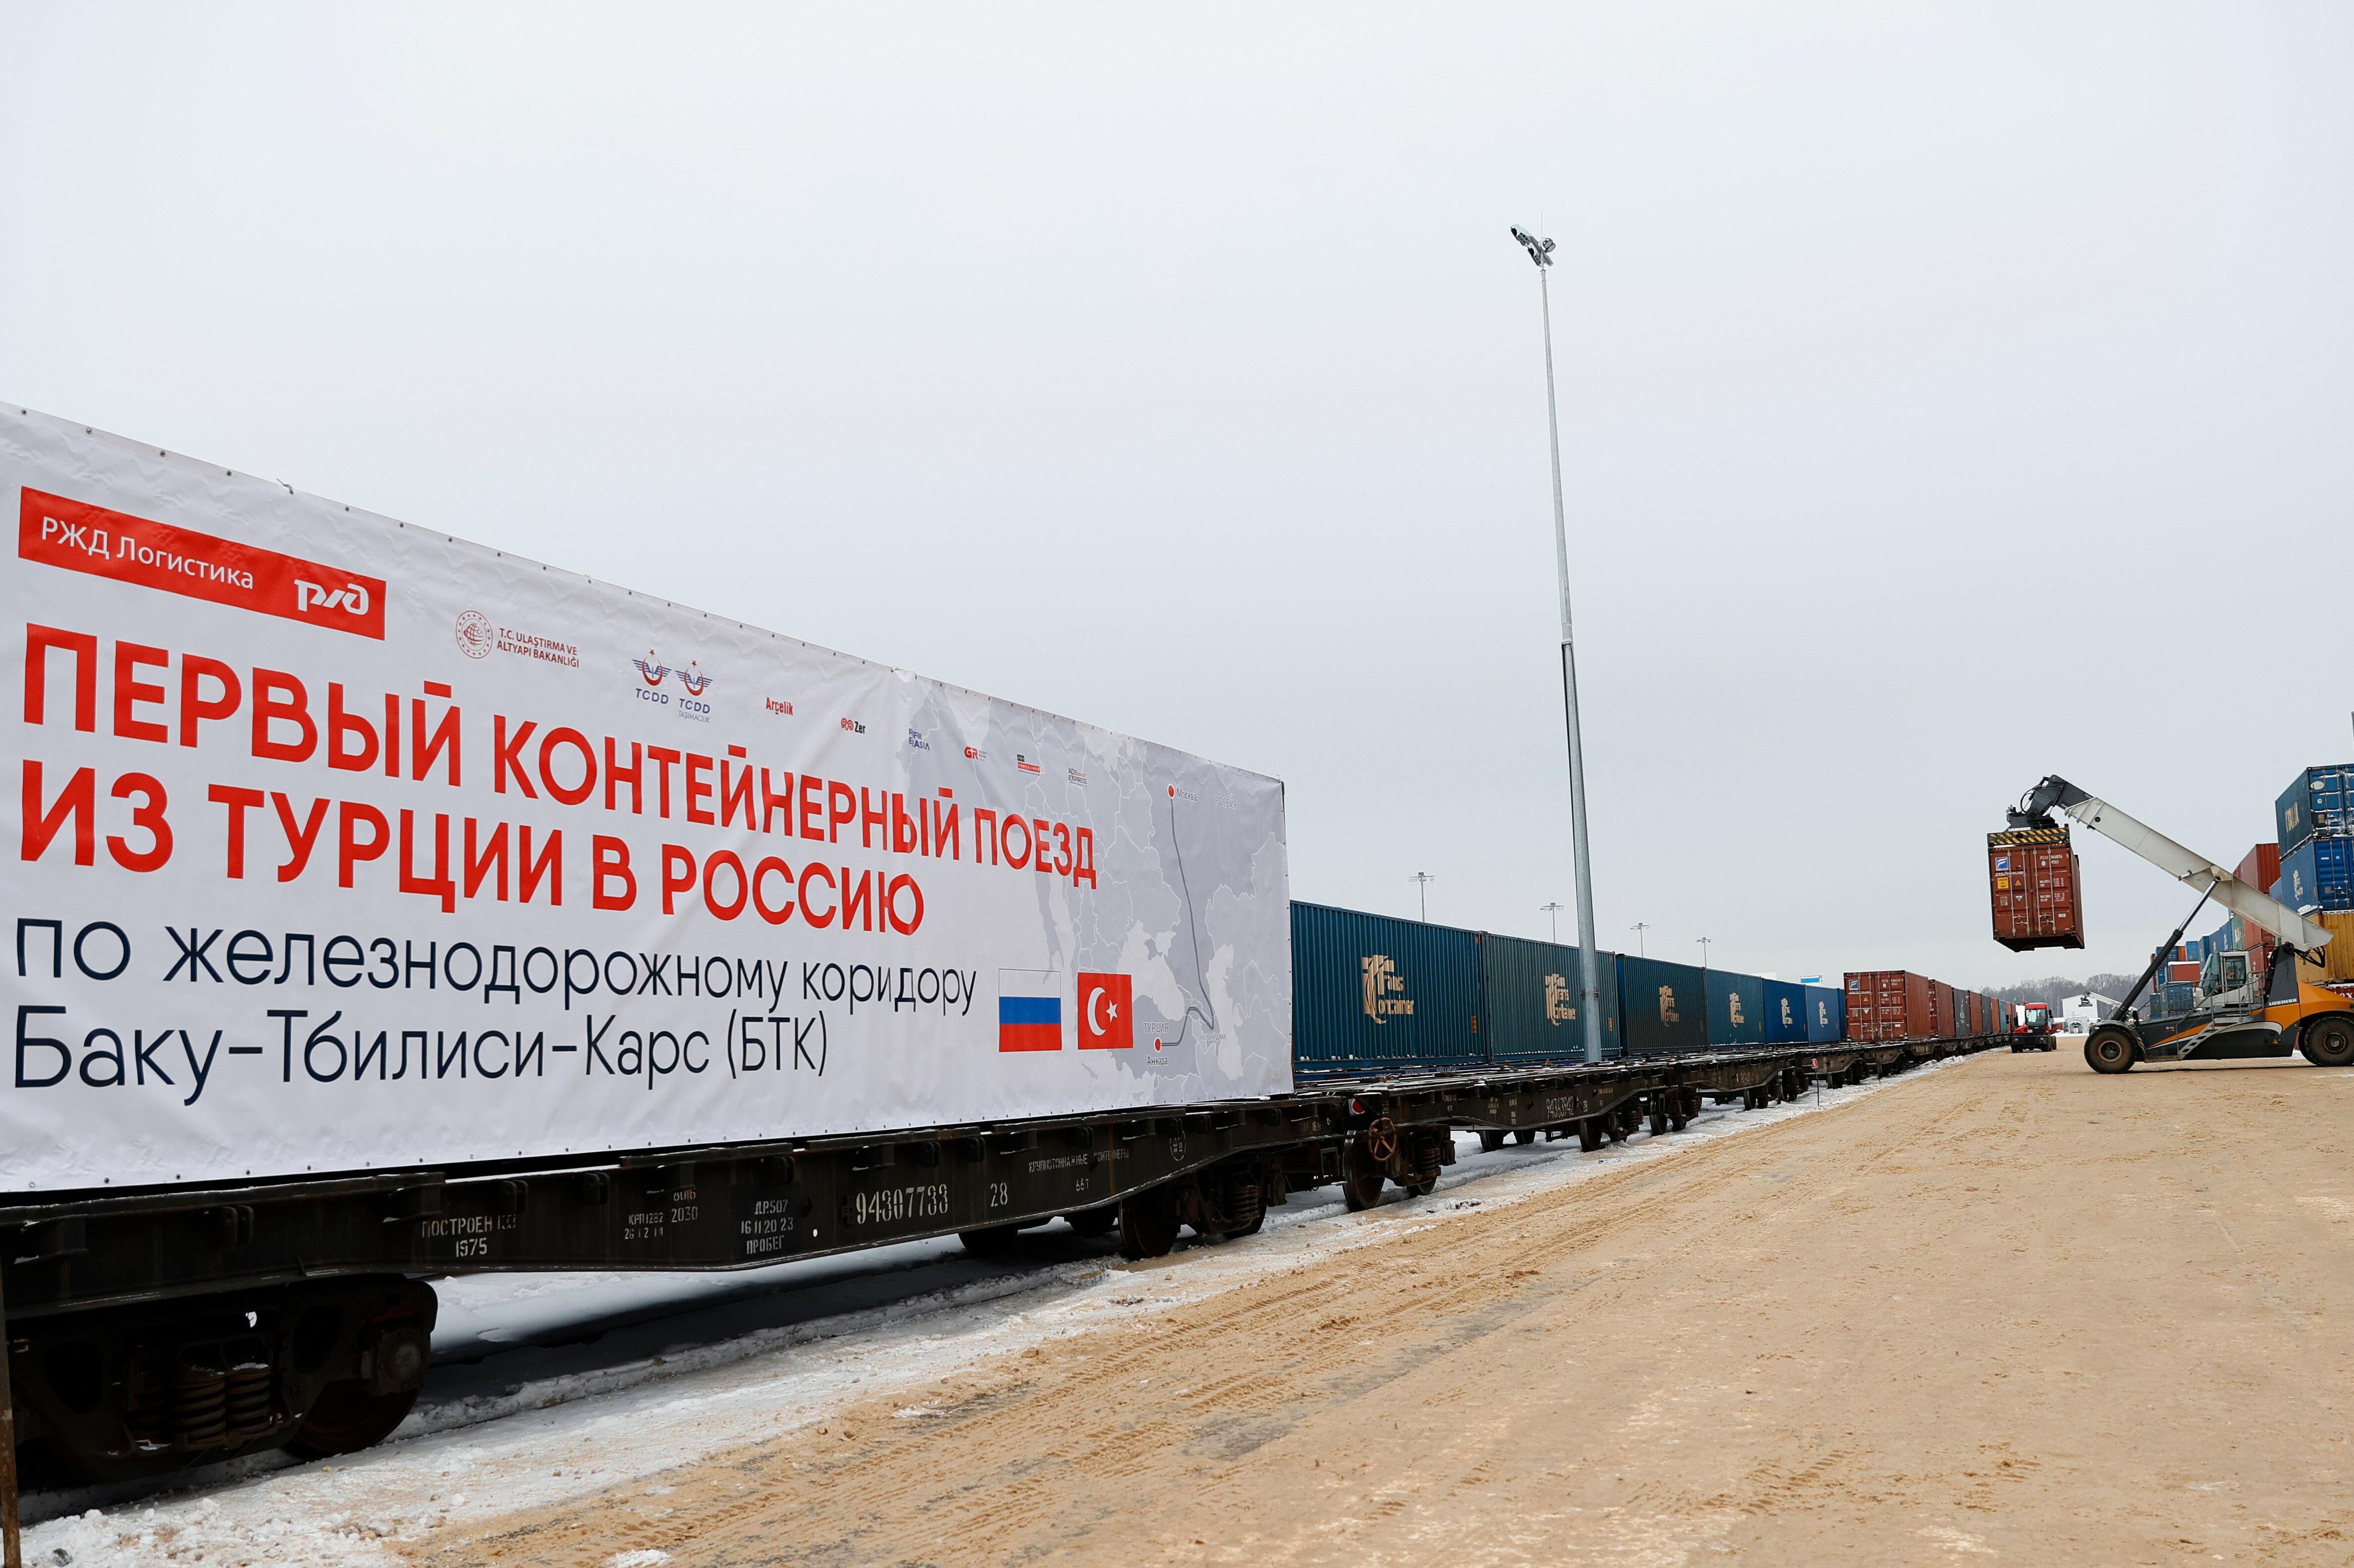 Photo of Բաքու-Թբիլիսի-Կարս երկաթուղով իրականացվել է Թուրքիայից Ռուսաստան 1-ին արտահանումը